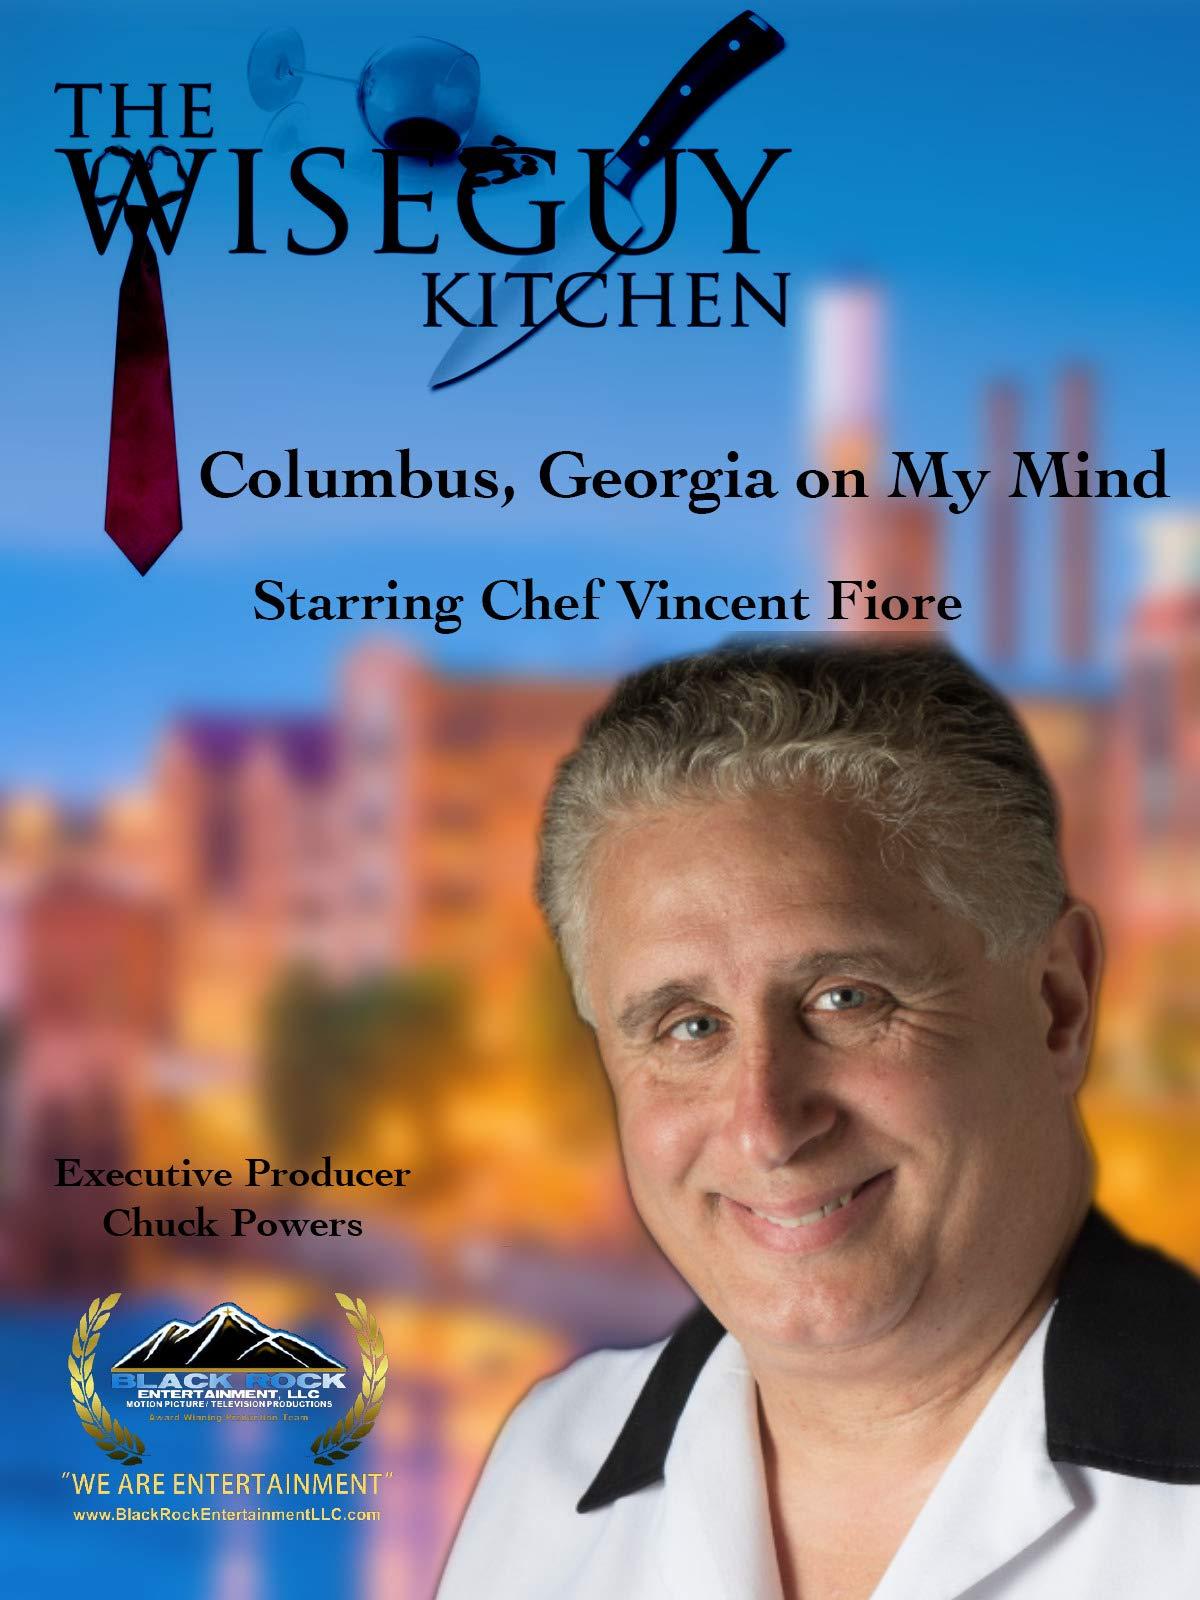 The Wiseguy Kitchen Show Visits Columbus Ga